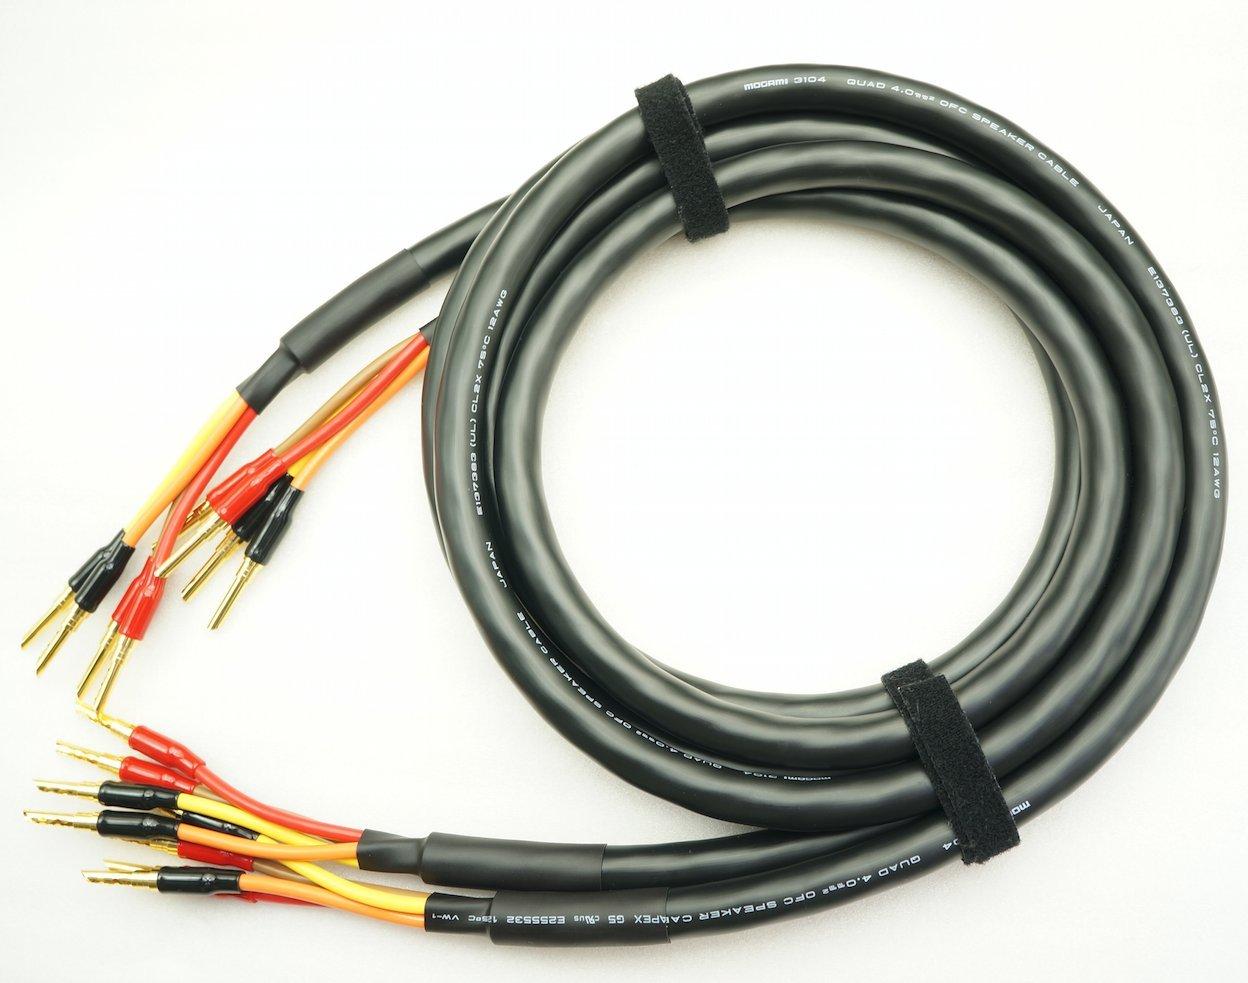 MOGAMI 3104 バイワイヤリング対応 2本ペア バナナプラグ付 スピーカーケーブル (4本-4本) (4m) B07B4G7554